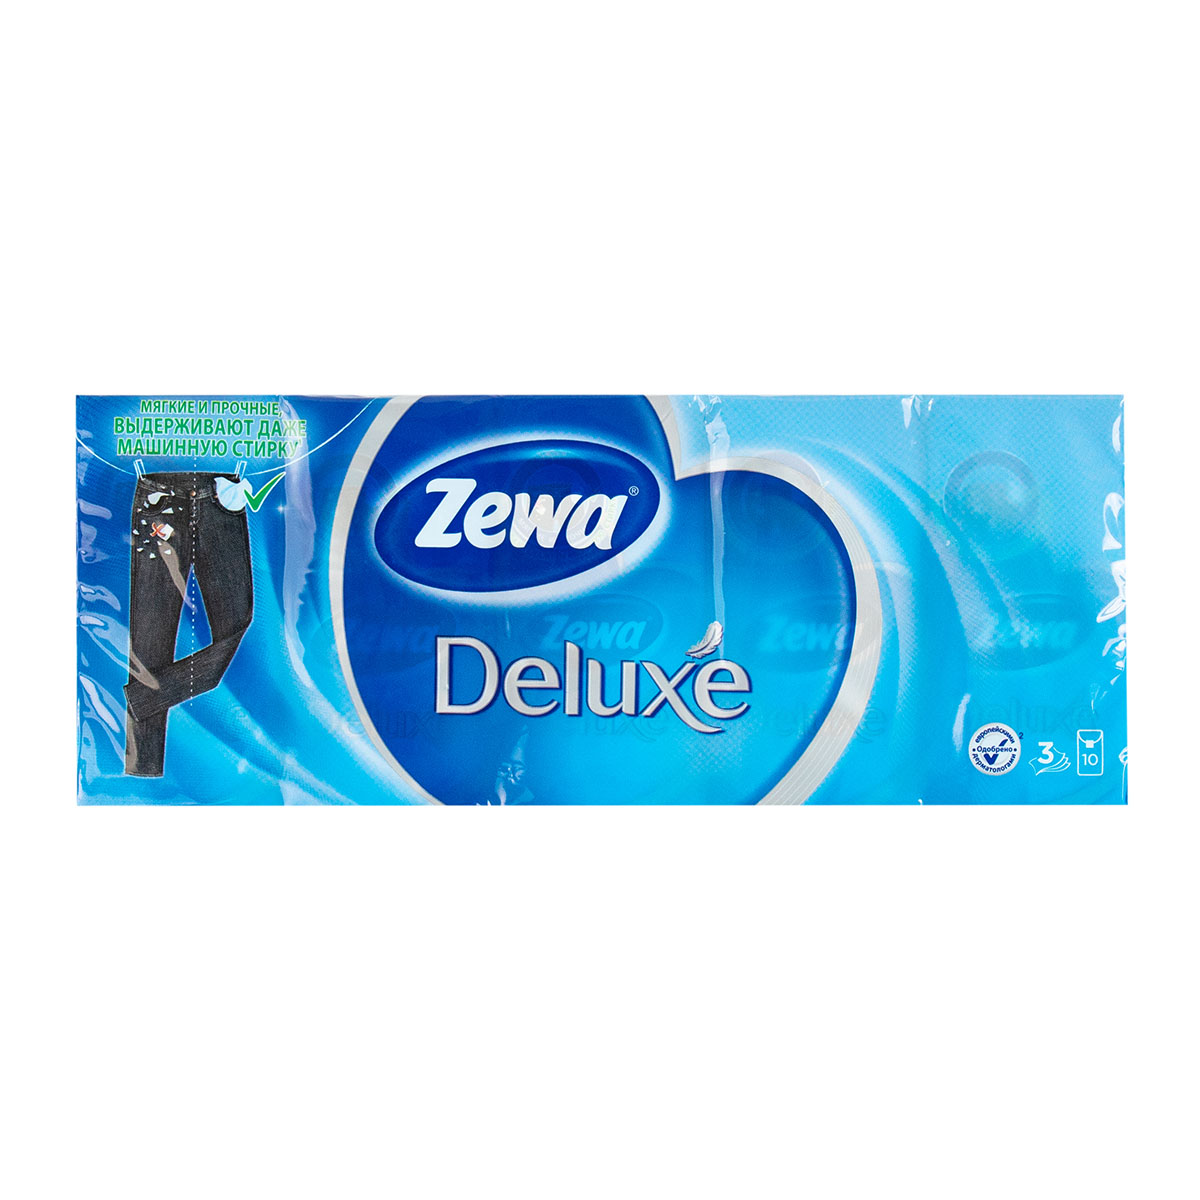 Zewa Deluxe